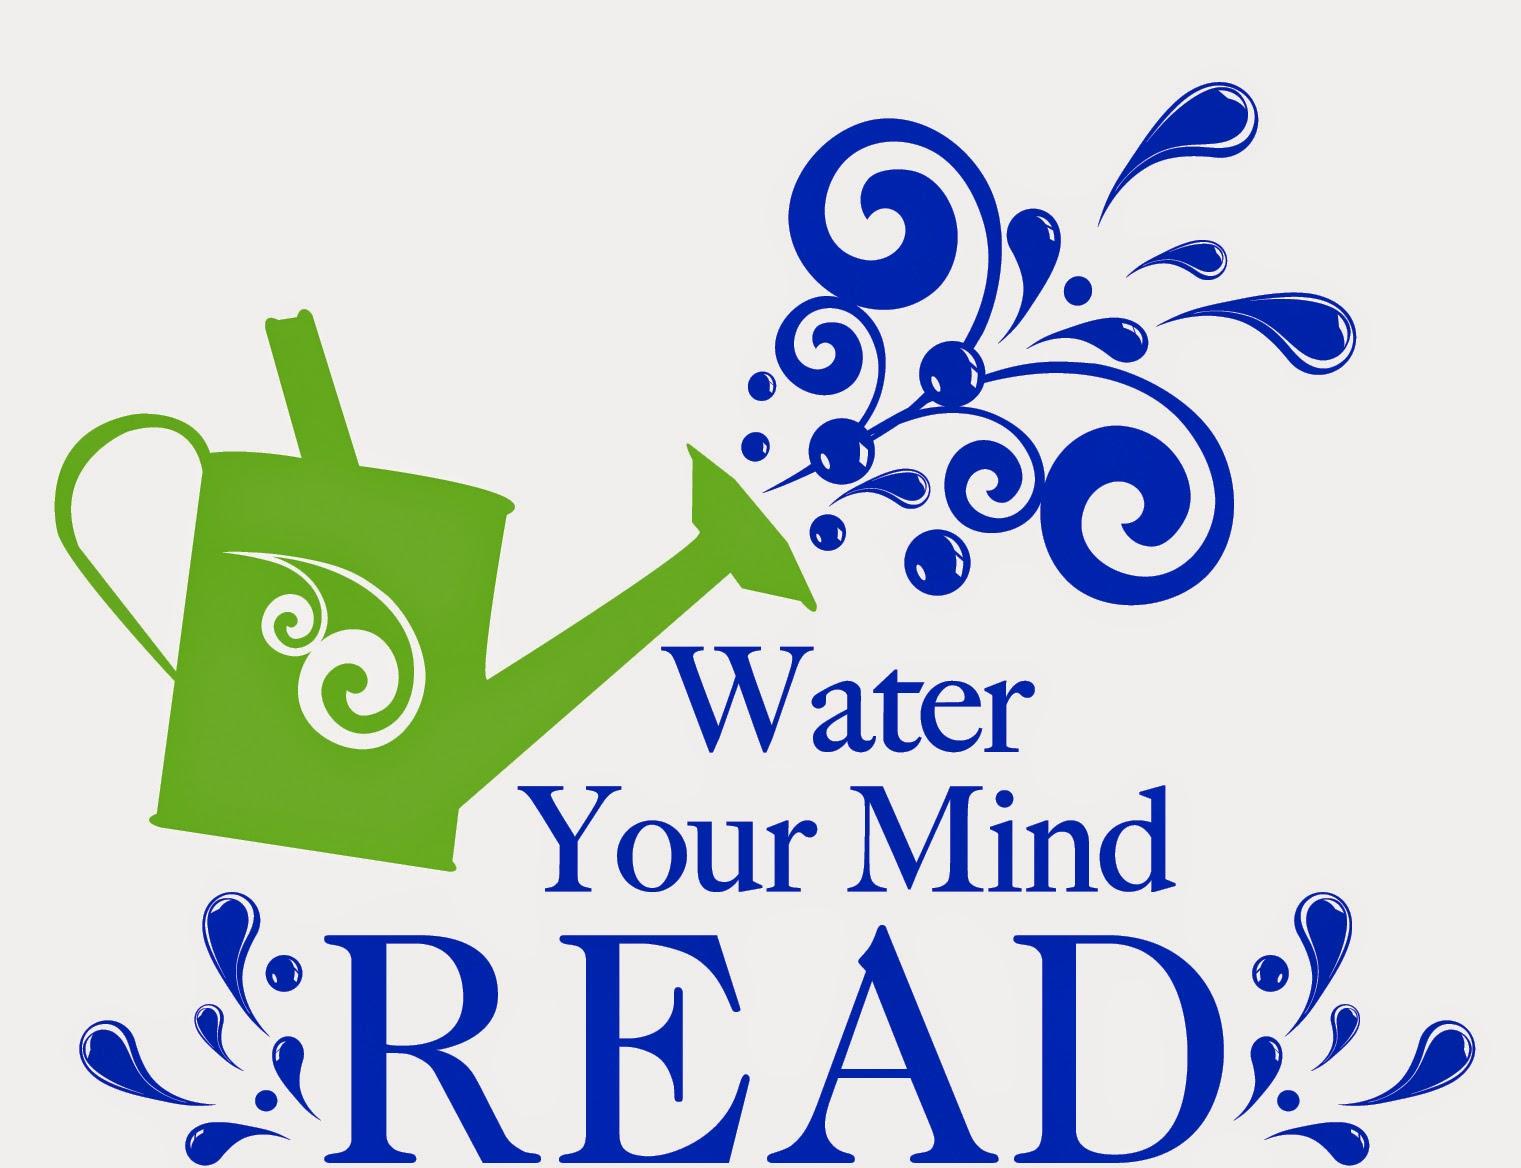 Kenapa Saya Membaca Buku Bahasa Inggris